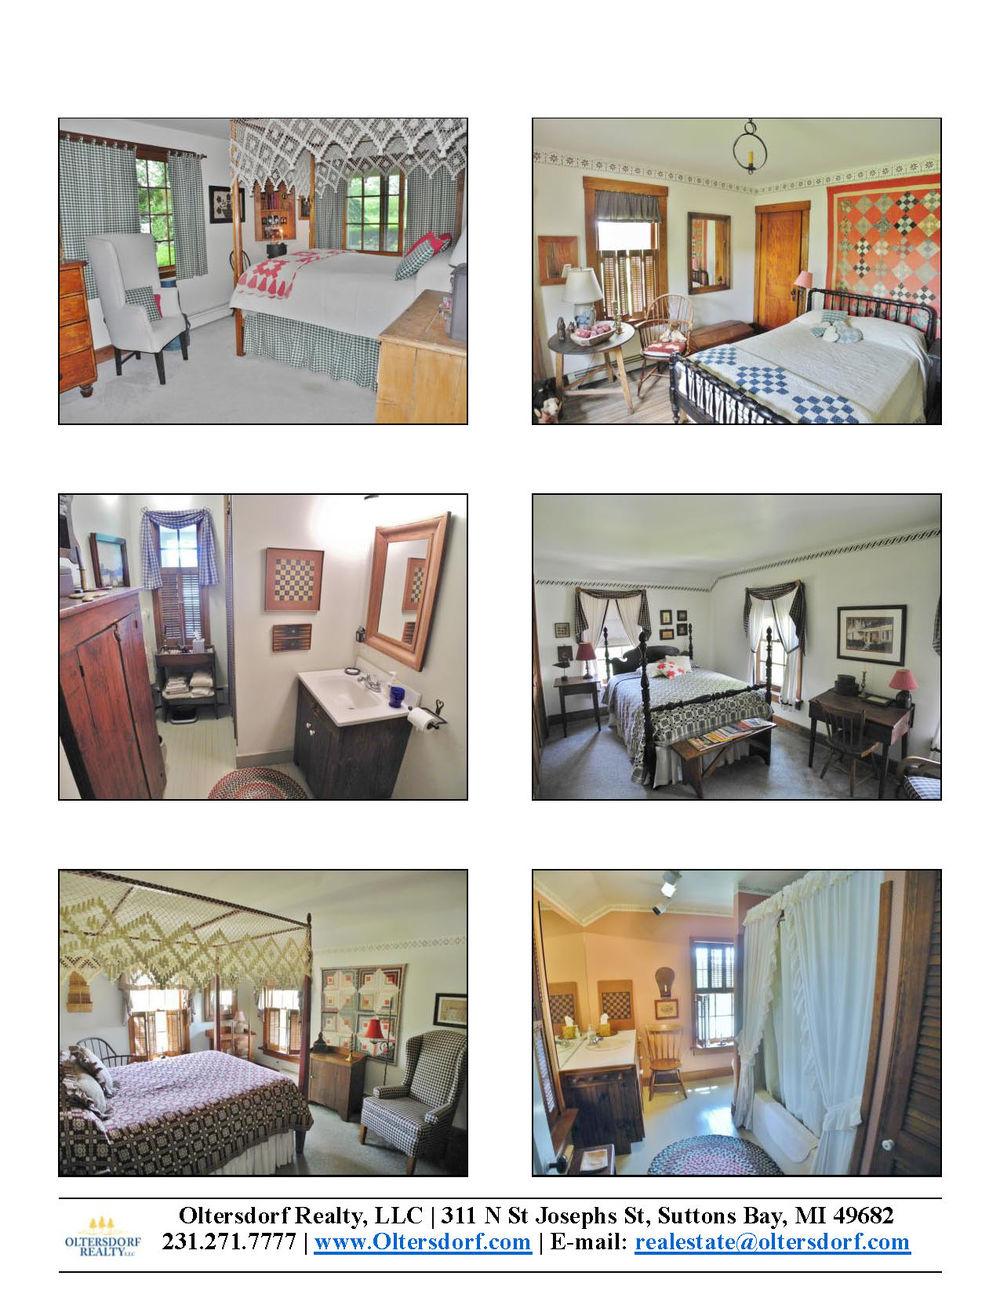 7251 E Alpers Road, Lake Leelanau, MI – Historic 1865 Centennial Inn For Sale By Oltersdorf Realty LLC Information Packet (6).jpg